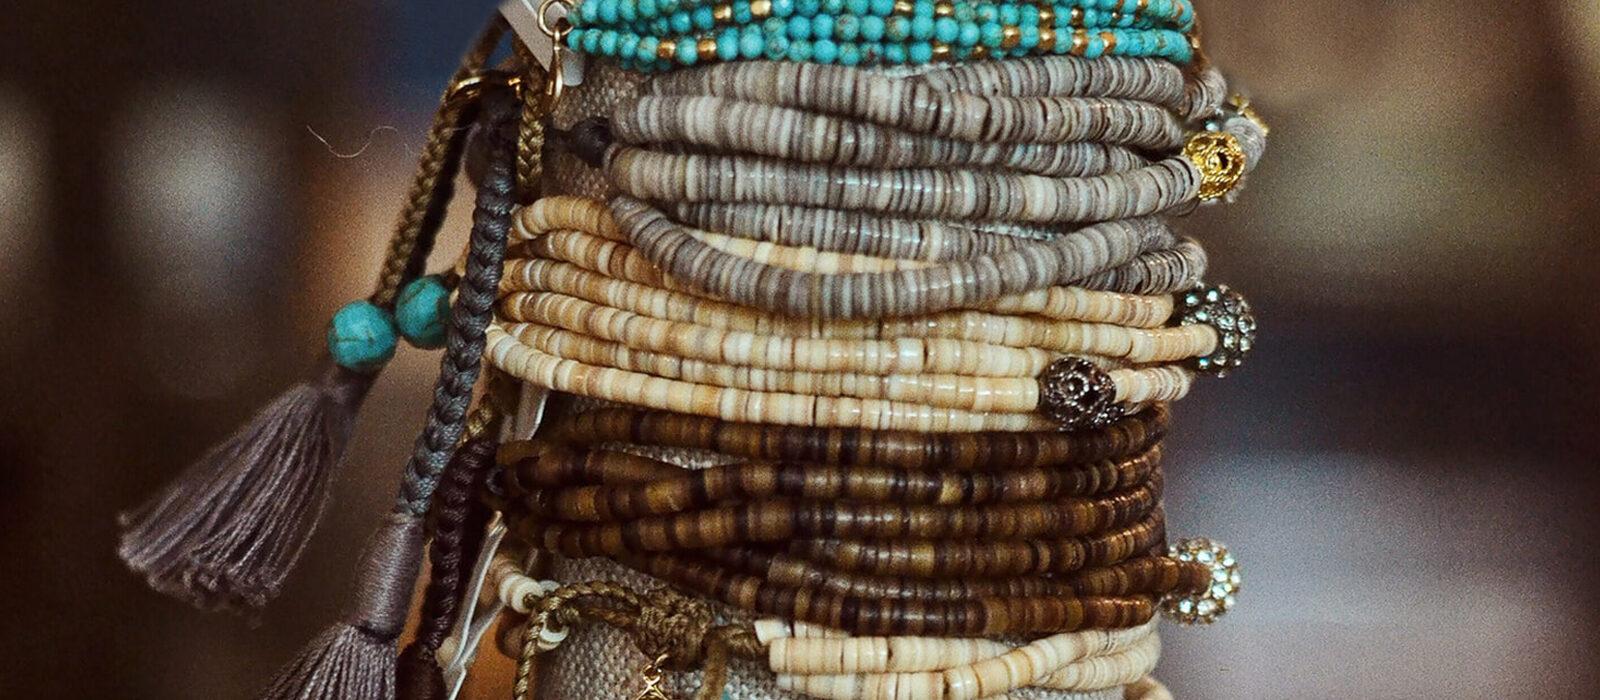 Handcrafted Treasures